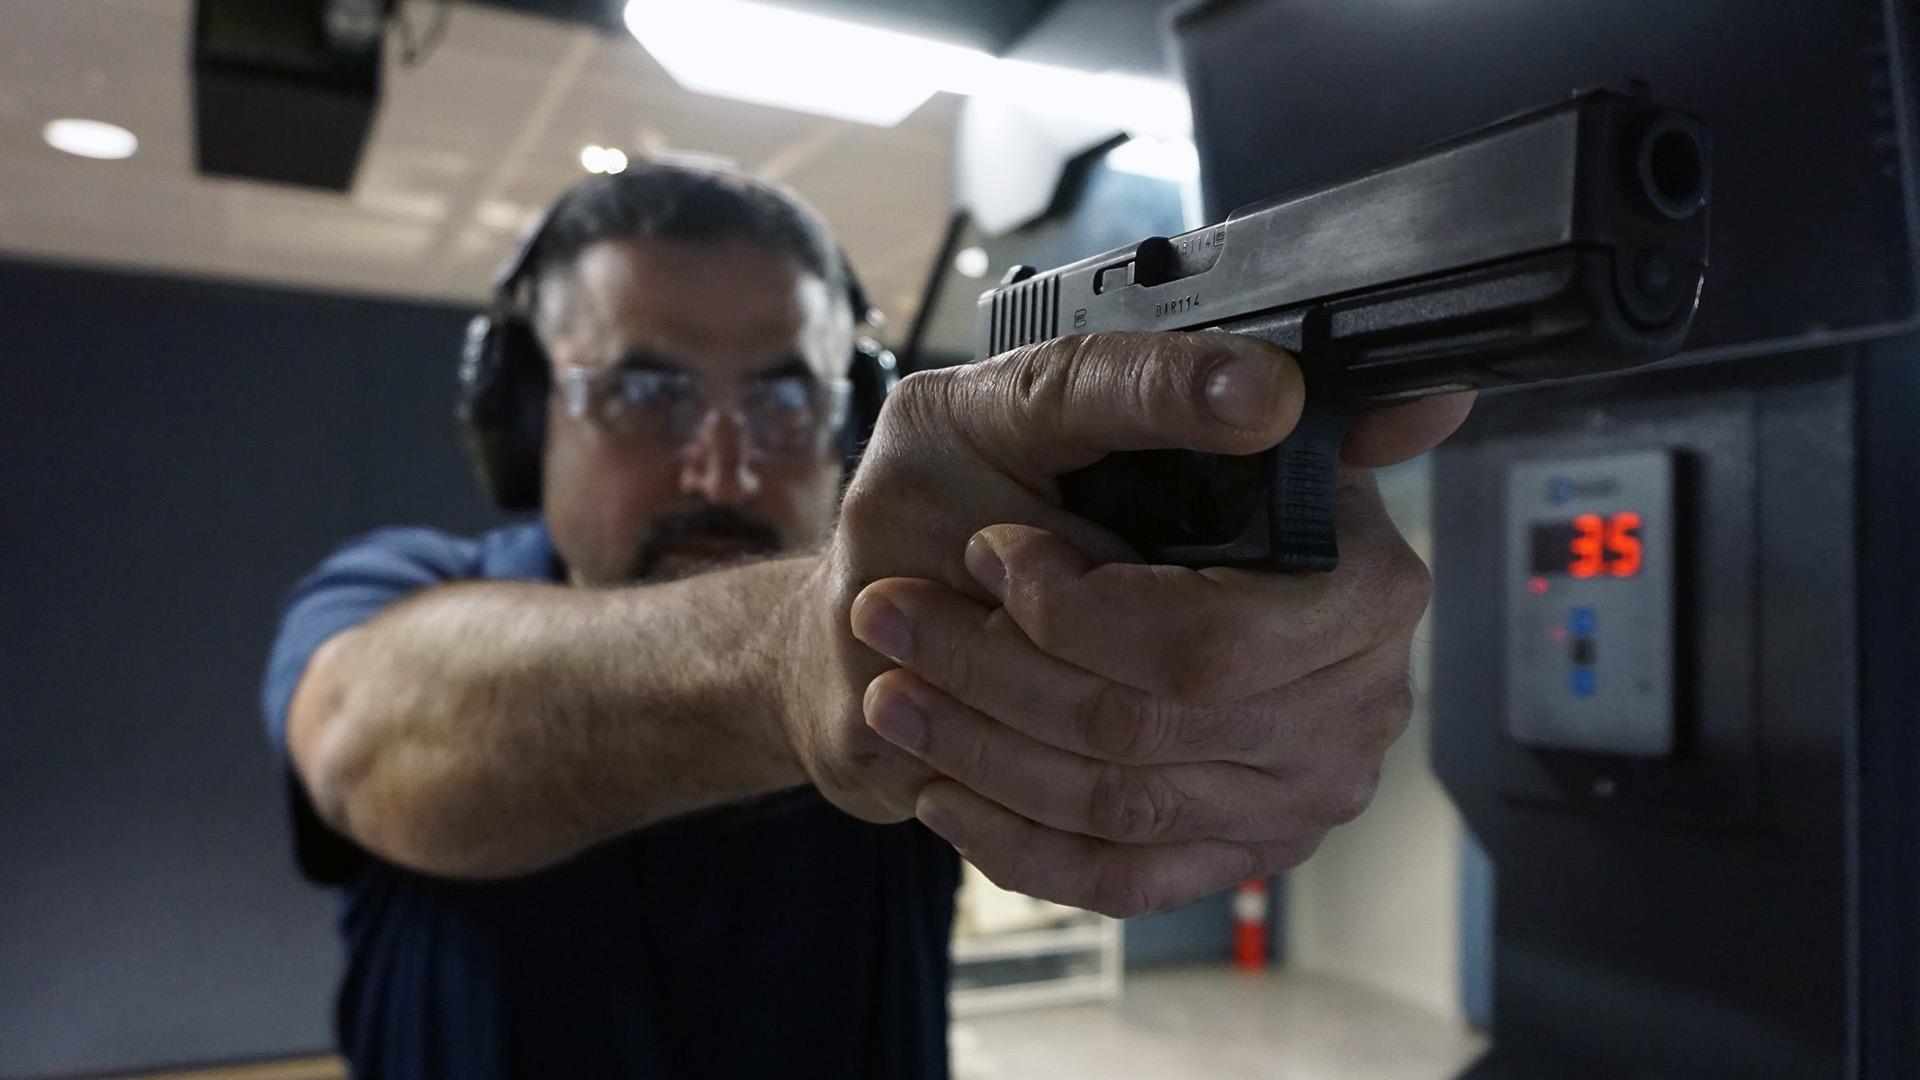 Image of man with handgun on range